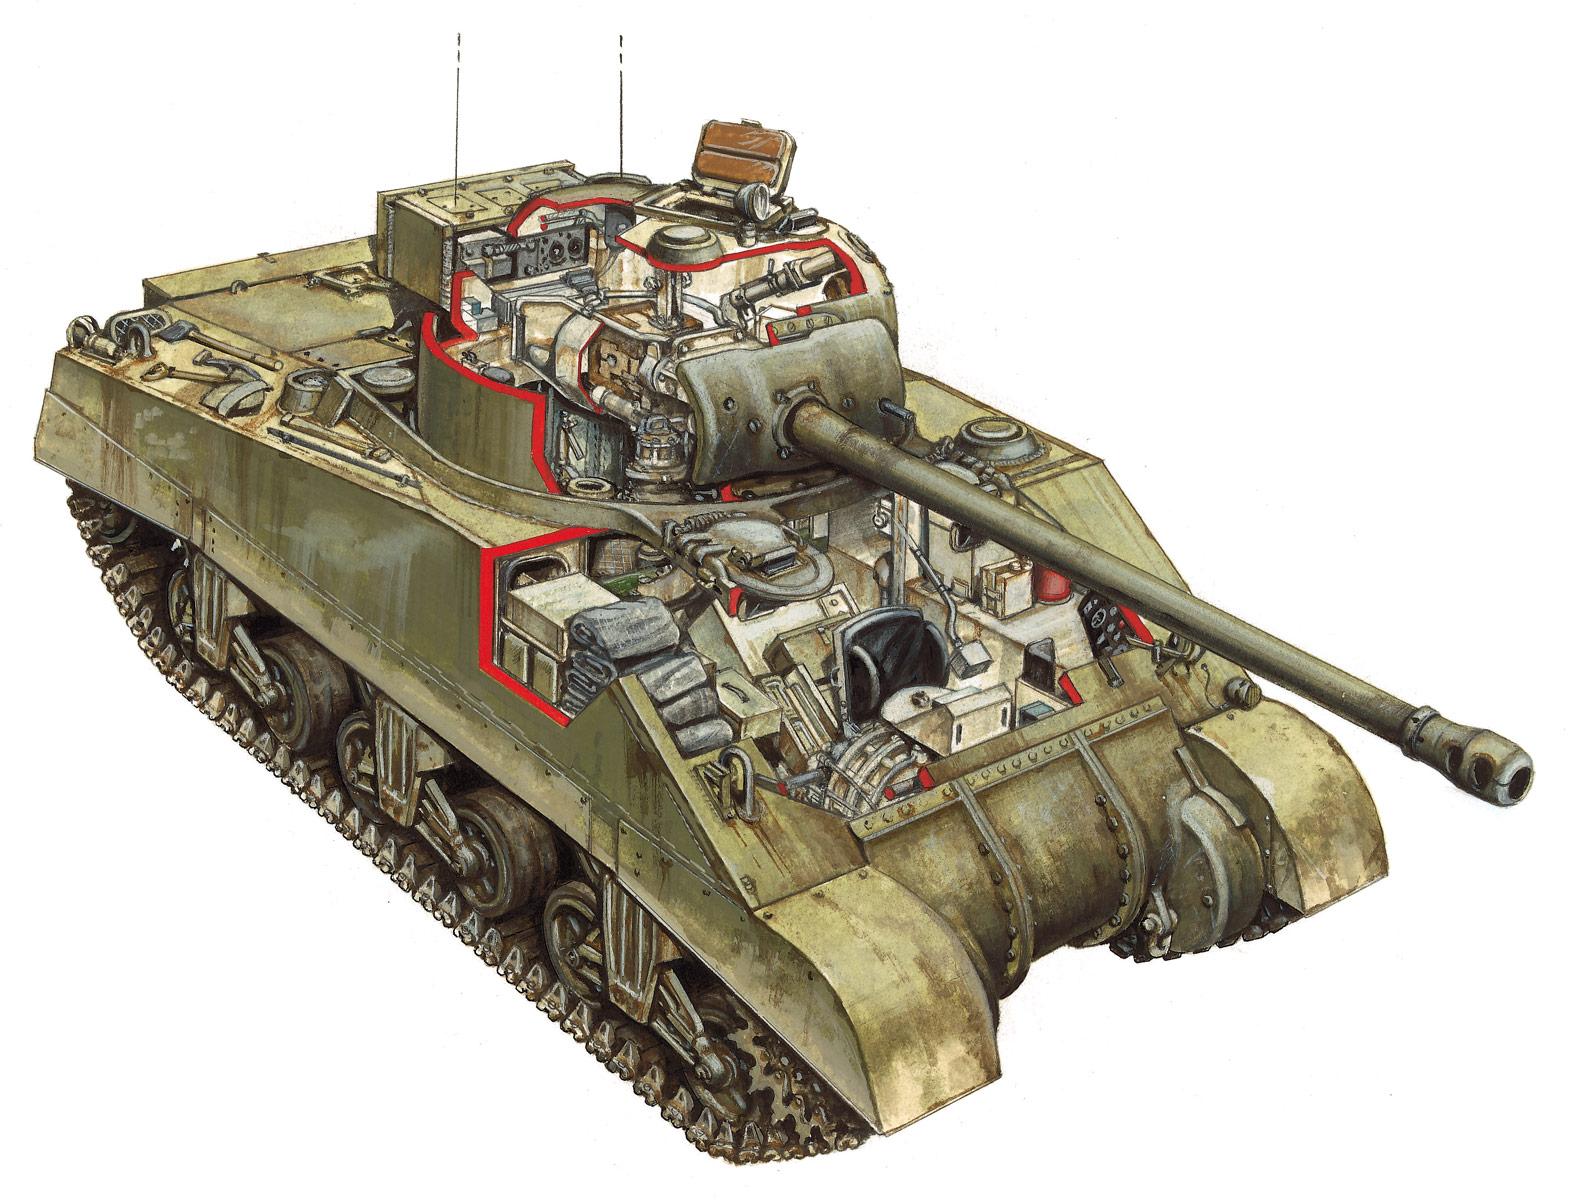 M4 Sherman cutaway